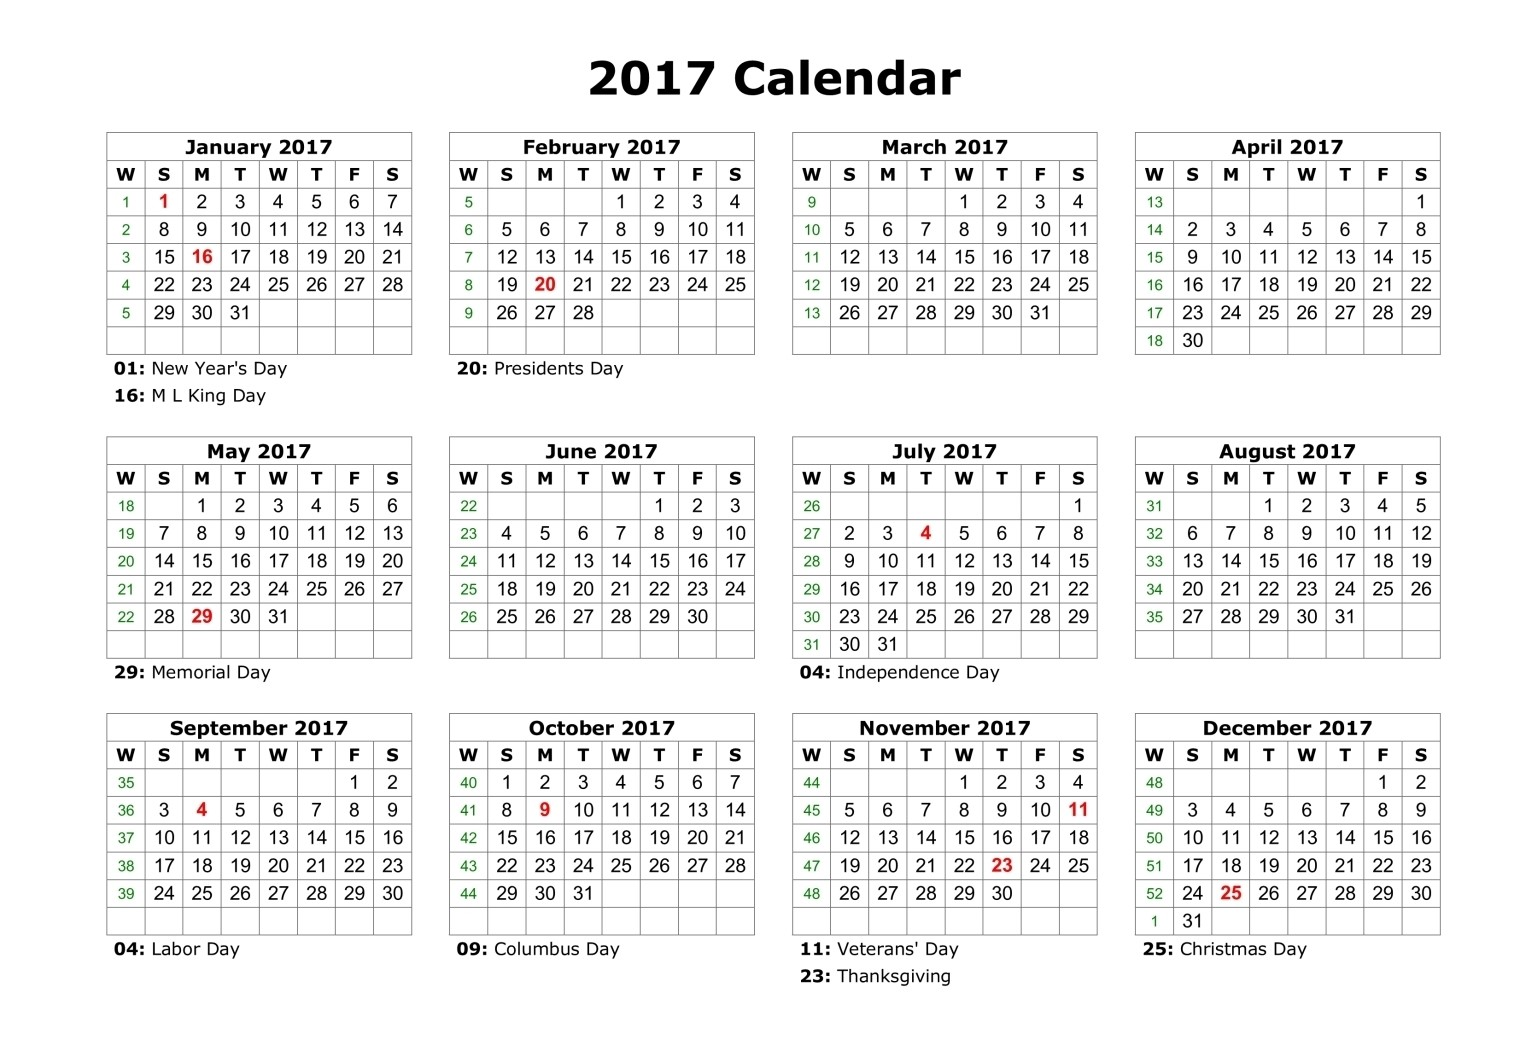 calendar 2017 with us holidays - Calendar